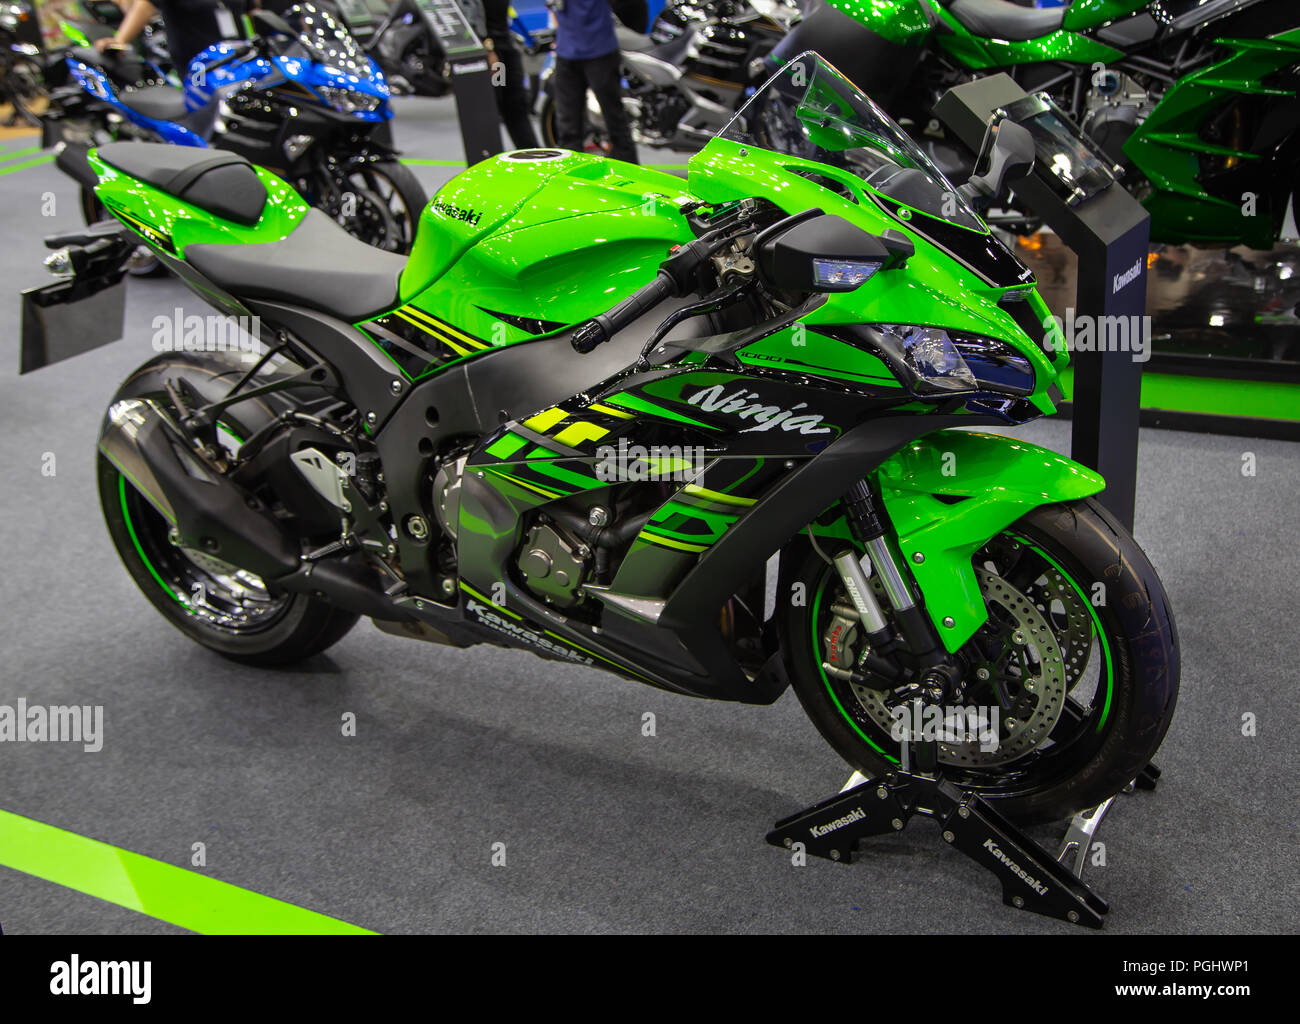 Bangkok Thailand 22 August 2018 Kawasaki Ninja 1000 Superbike